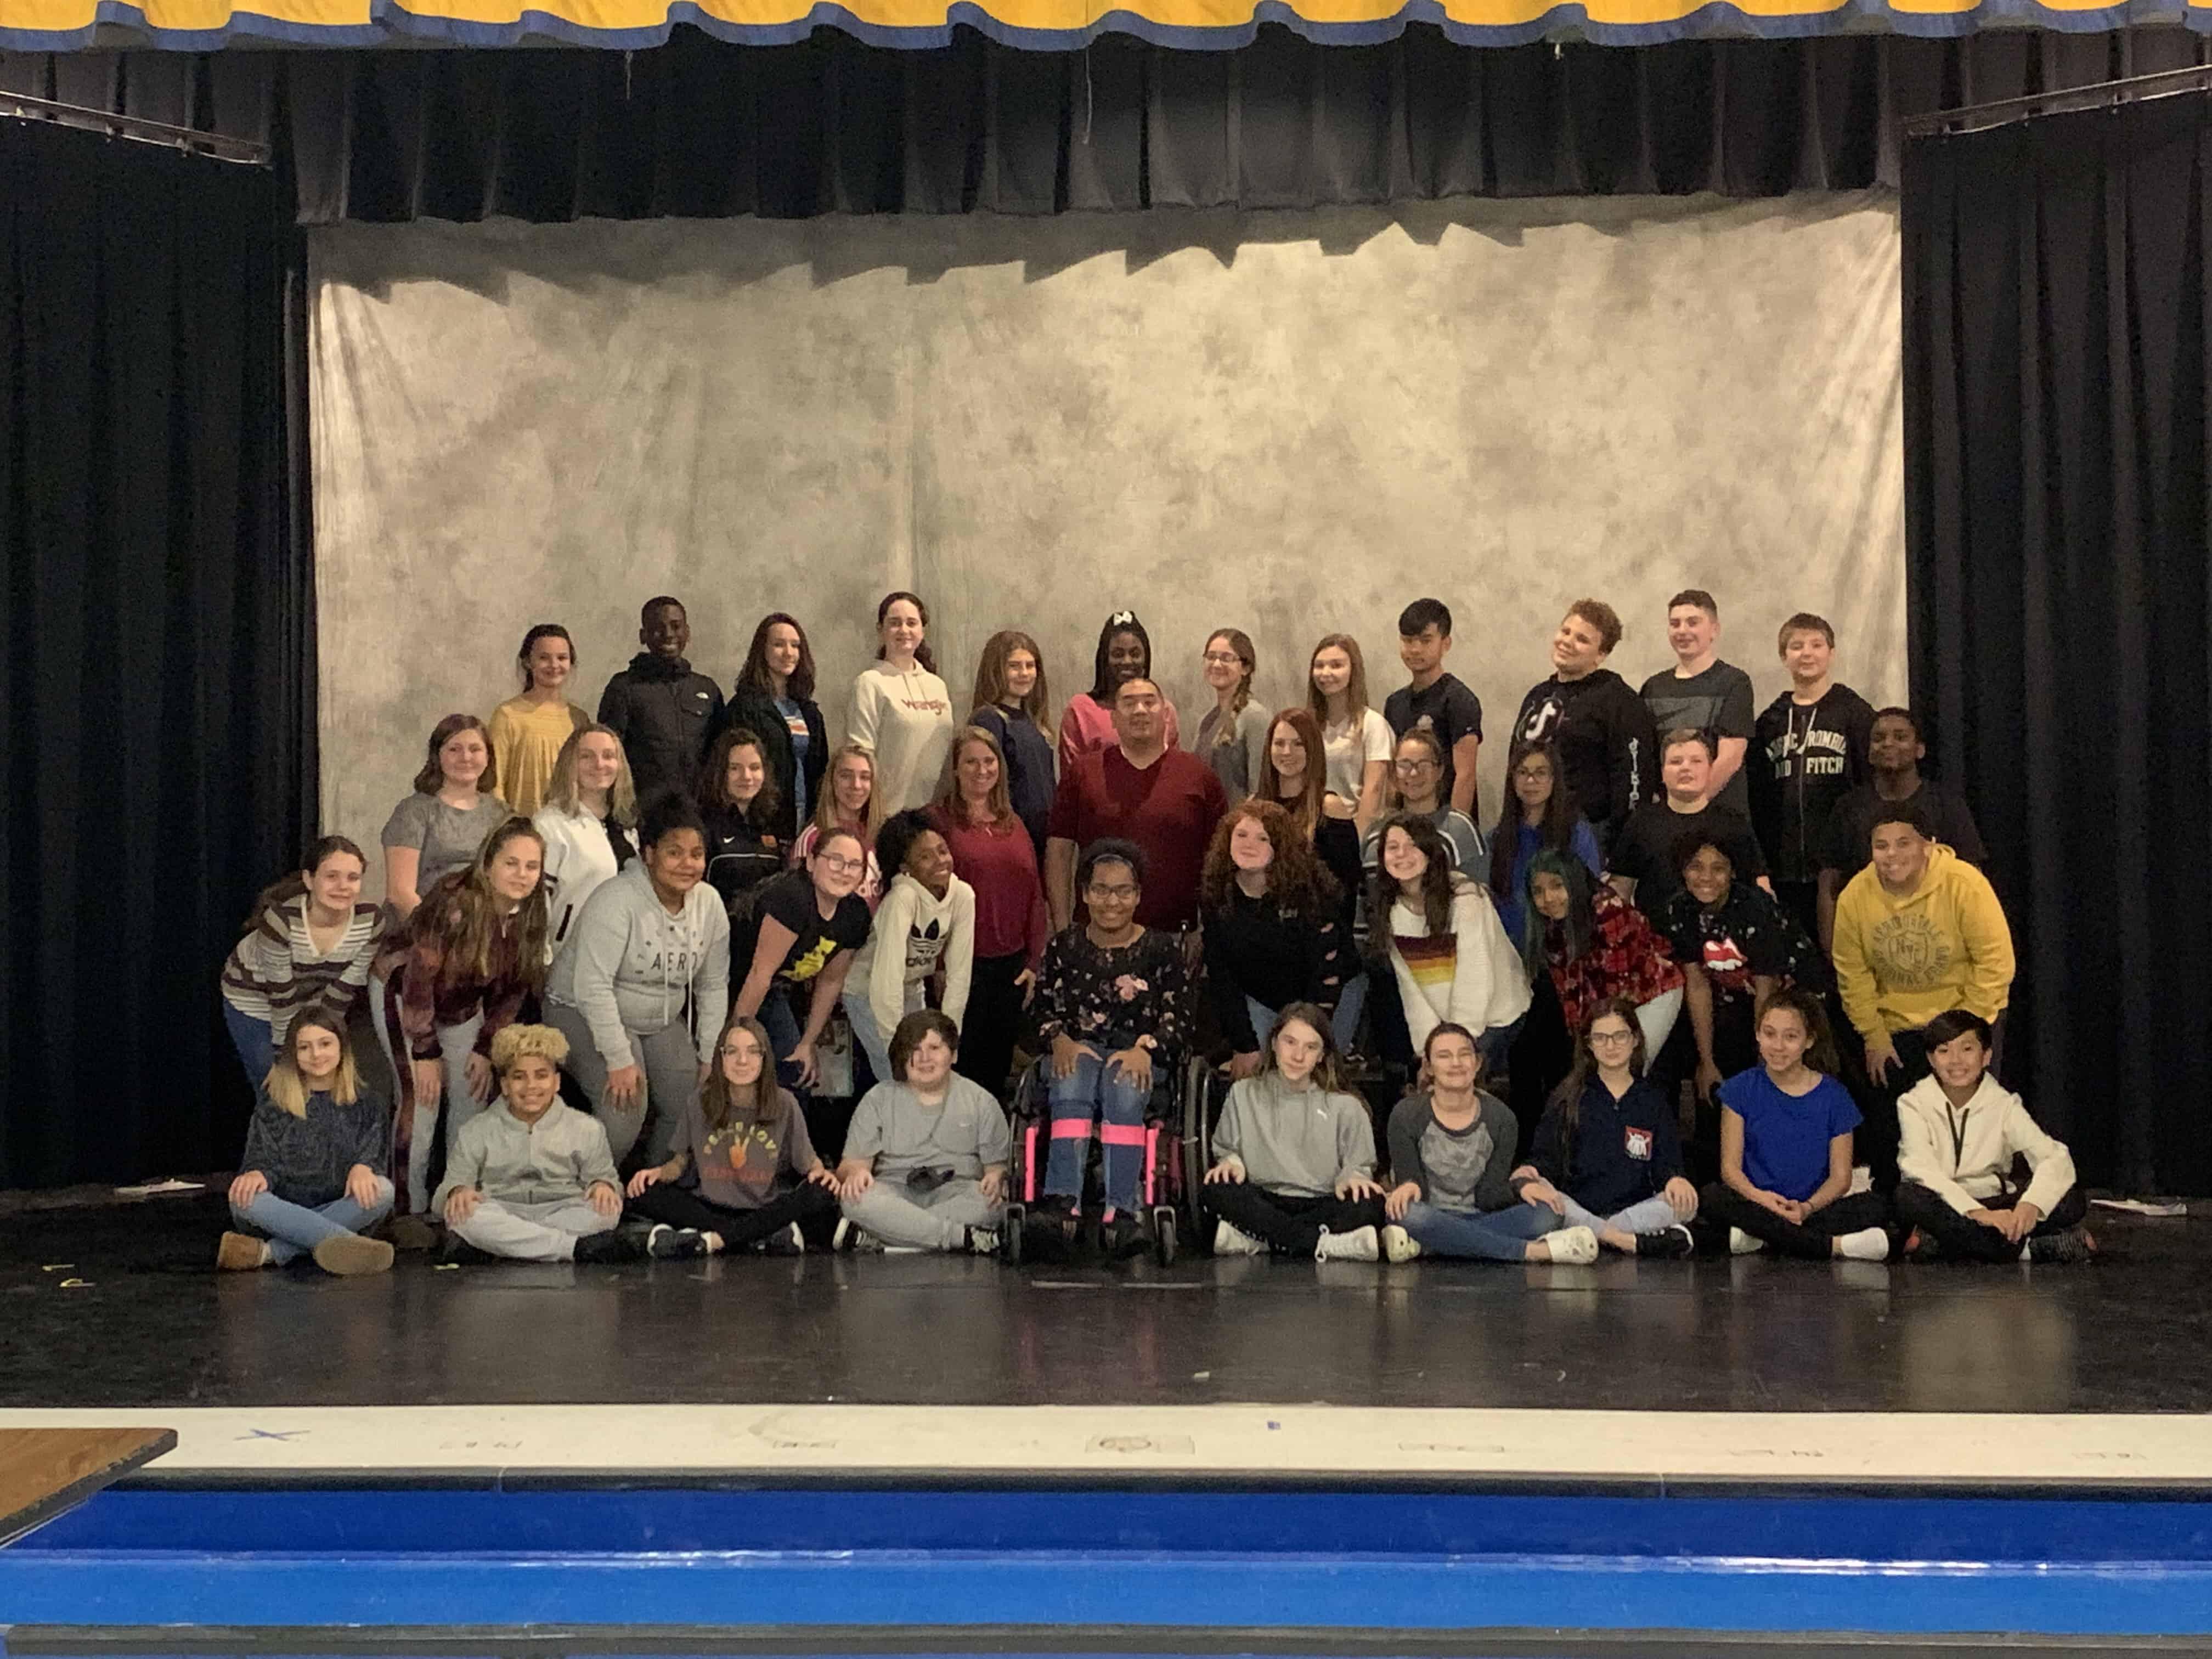 Sun Valley Community School: Musical Theater Camp